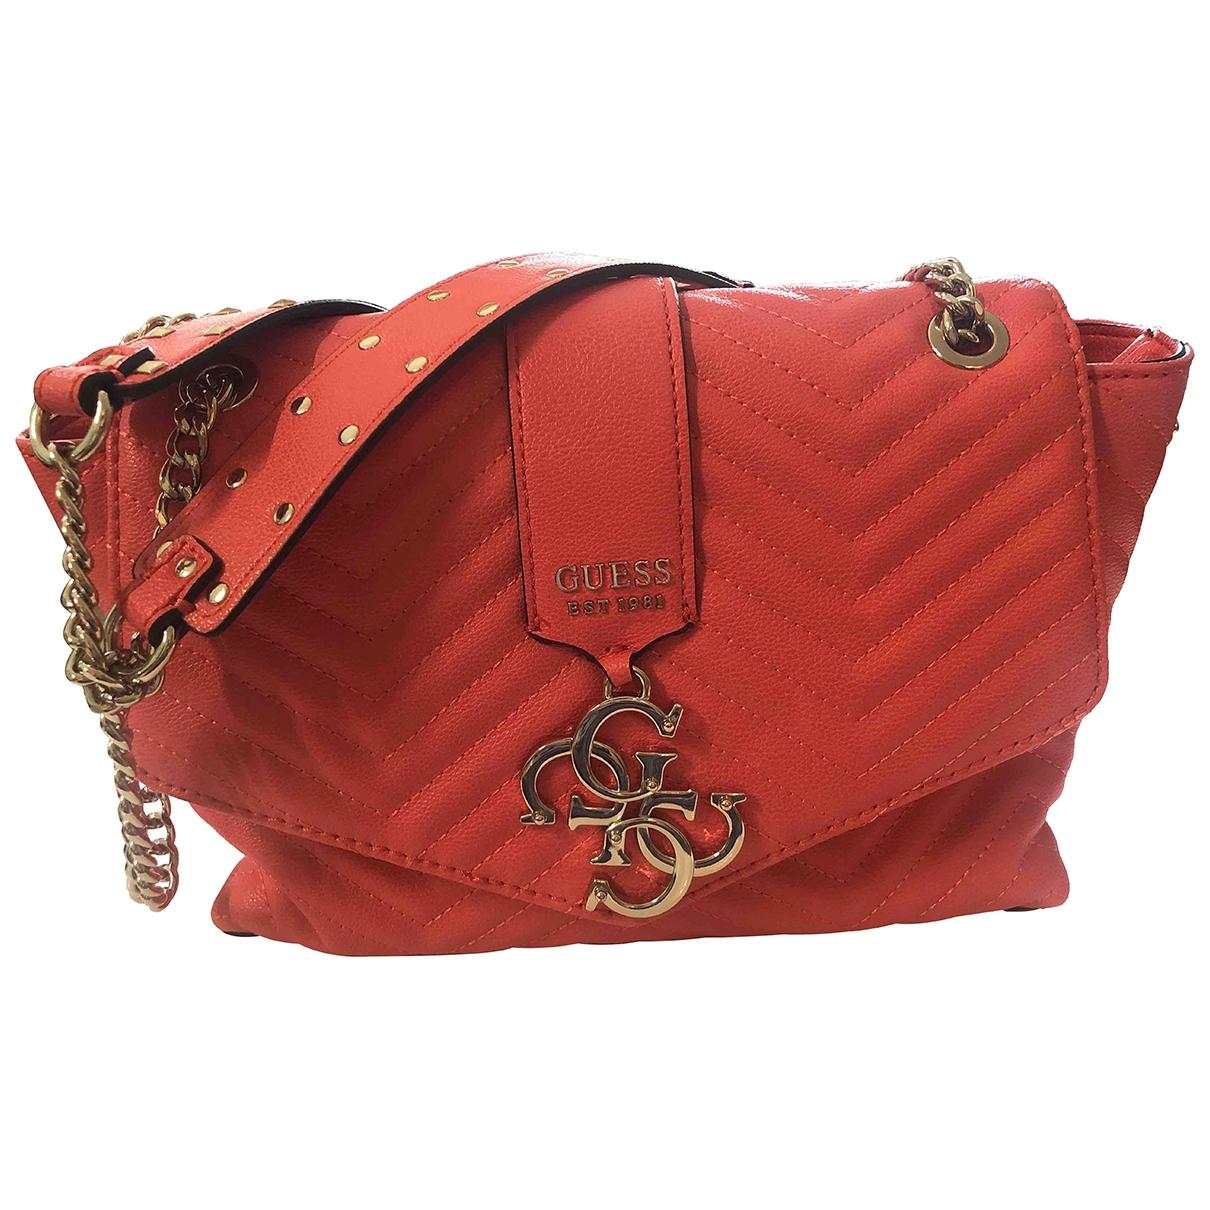 Guess \N Orange Patent leather handbag for Women \N